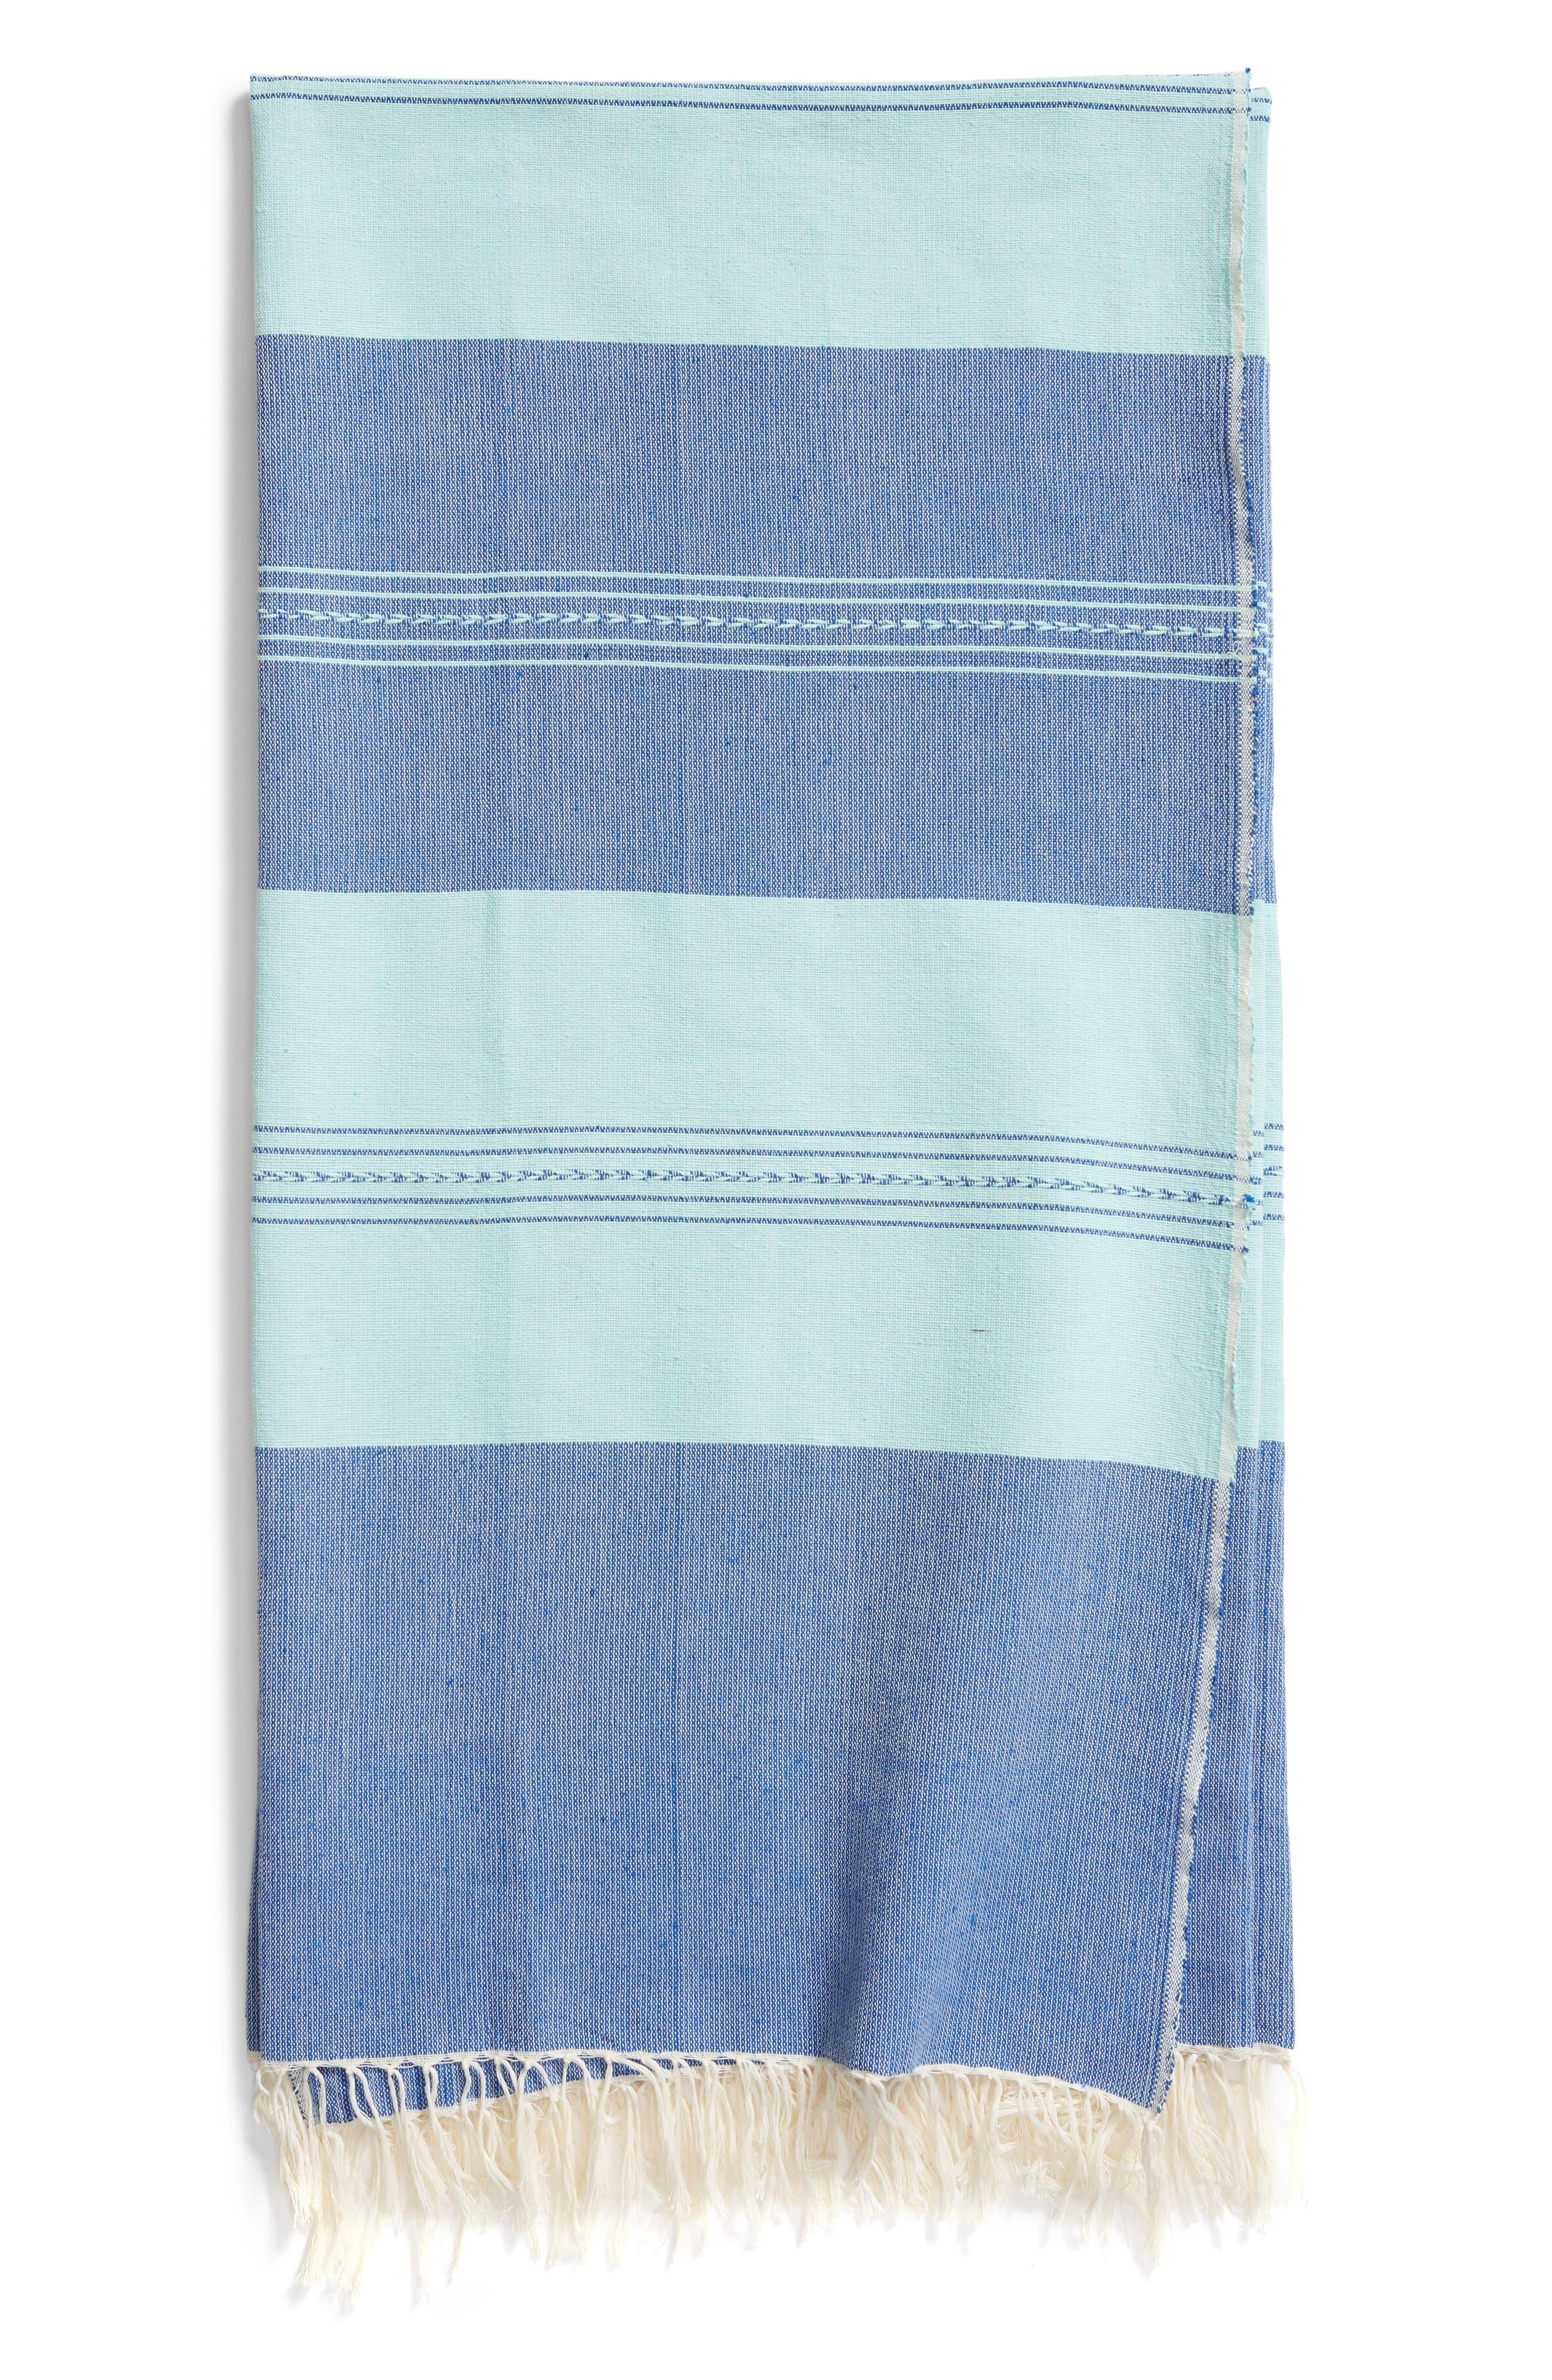 Aegean Sea Woven Cotton Blanket,                             Main thumbnail 1, color,                             GREEN/BLUE